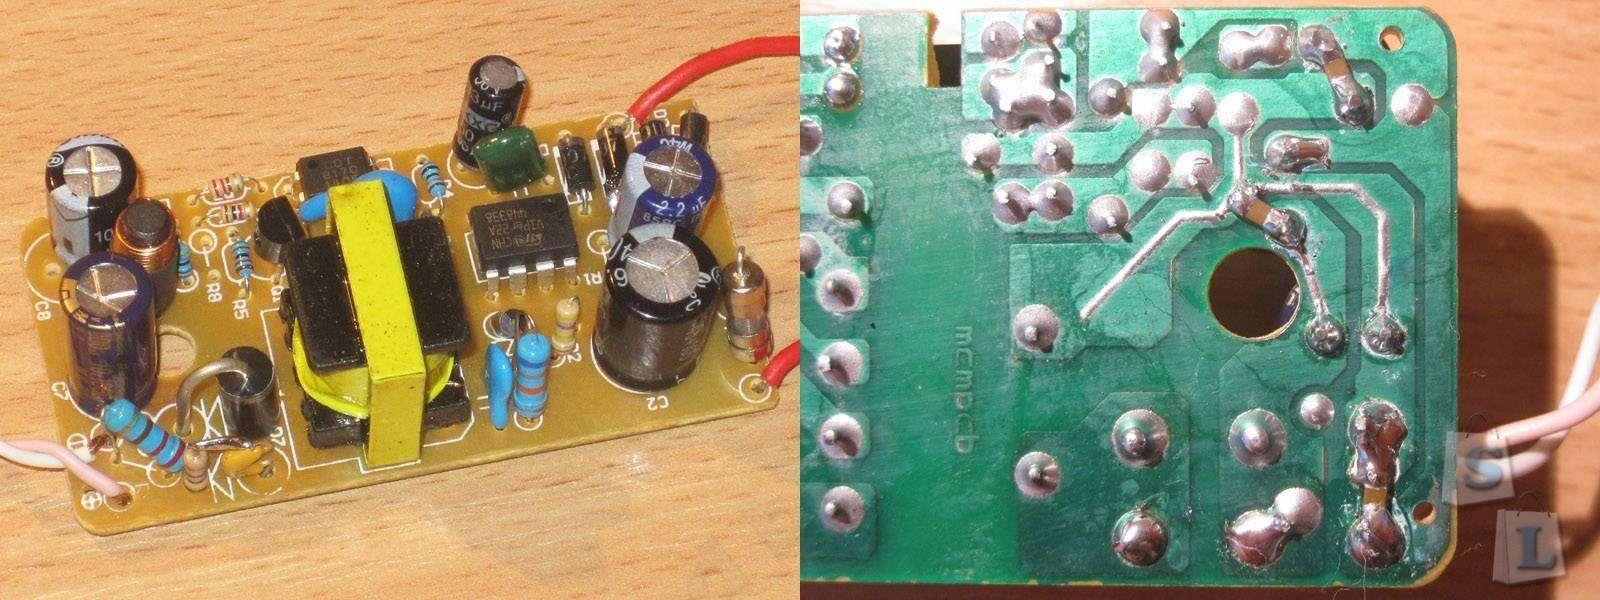 ChinaBuye: 5 Вольт 2 Ампера блок питания с microUSB штеккером